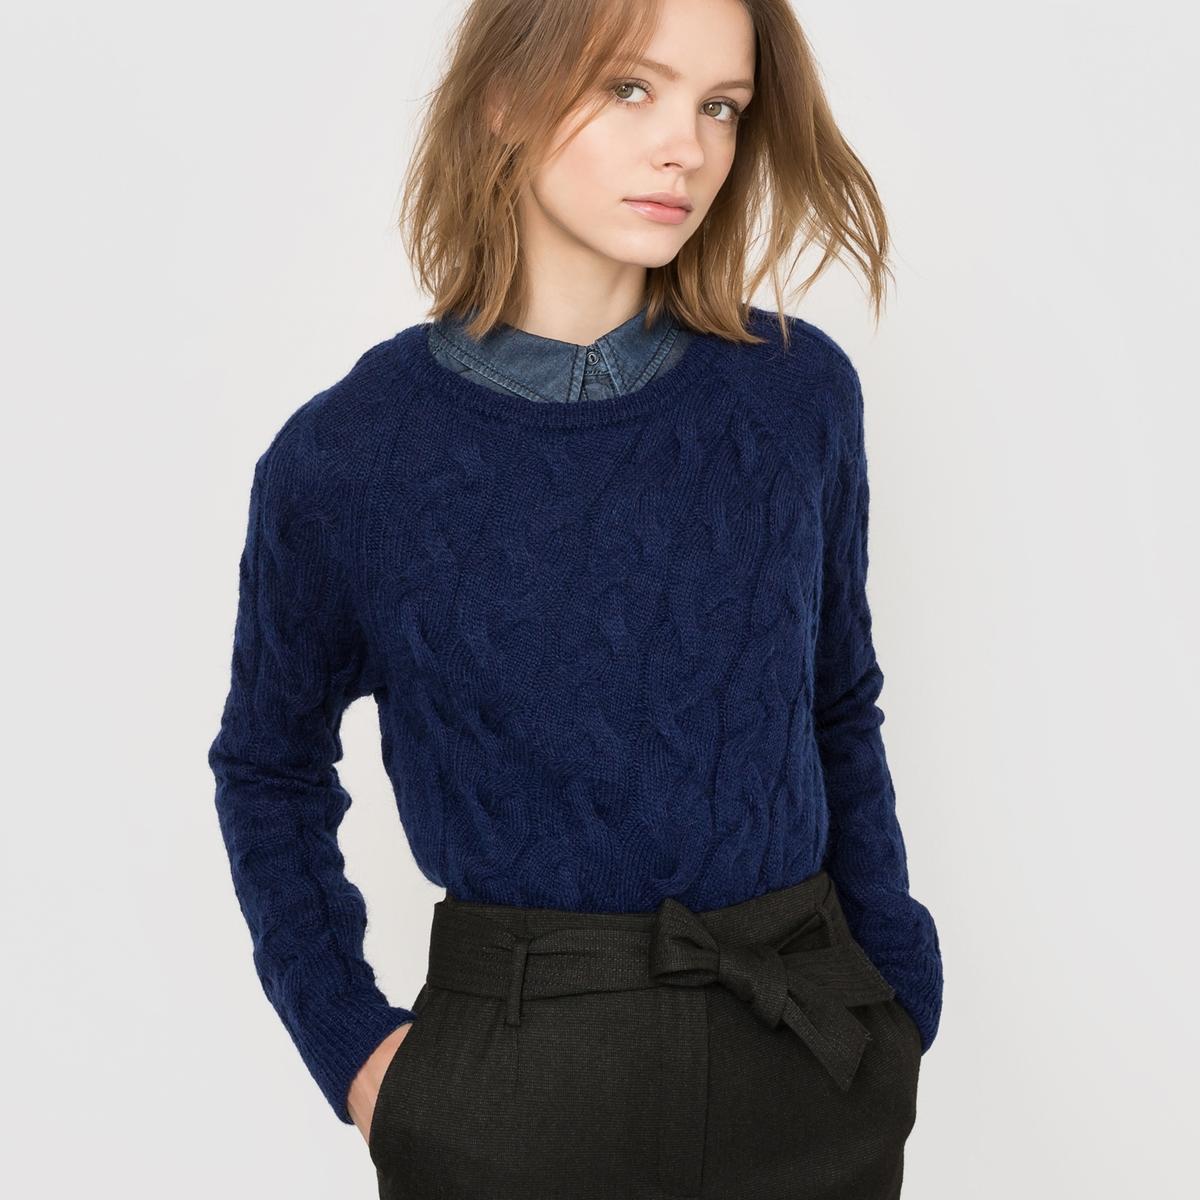 Пуловер с узором косы, шерсть/мохер